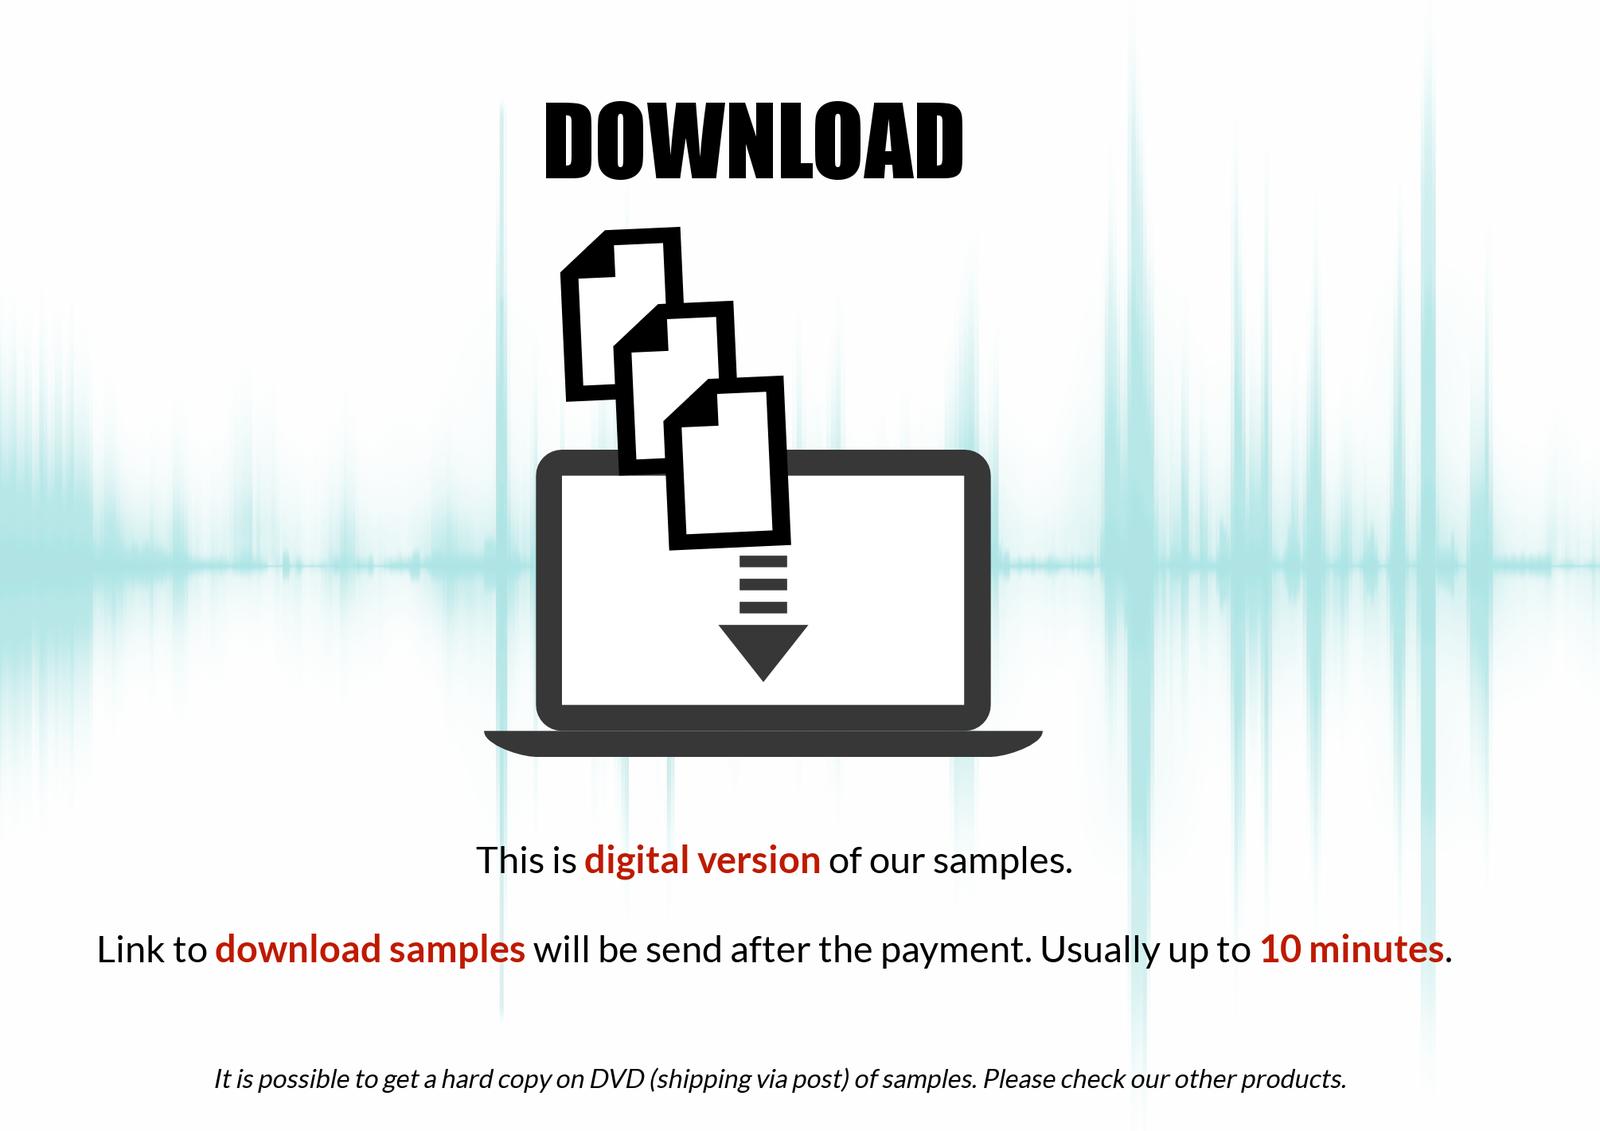 Biblioteca de sonido Jeremy Sylvester productor Vol. Vol. Vol. 2 [Digital] 0b2f6b